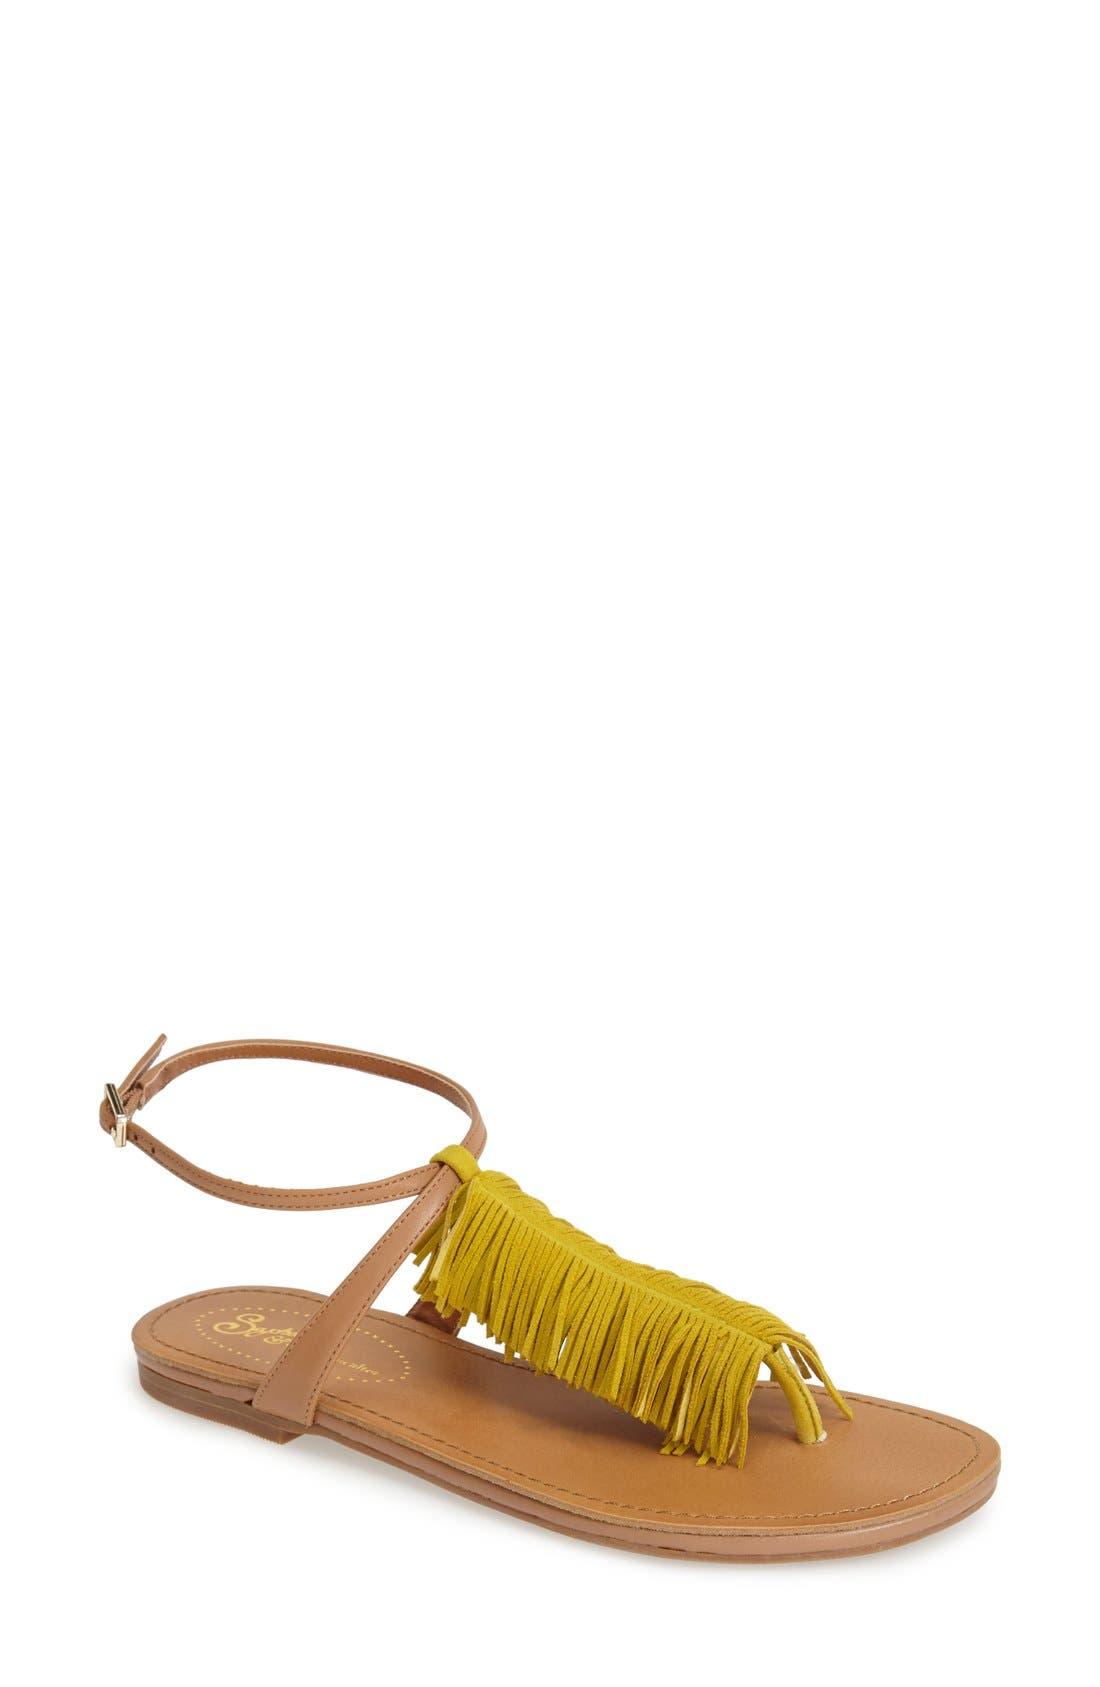 Alternate Image 1 Selected - Seychelles 'Confetti' Ankle Strap Sandal (Women)